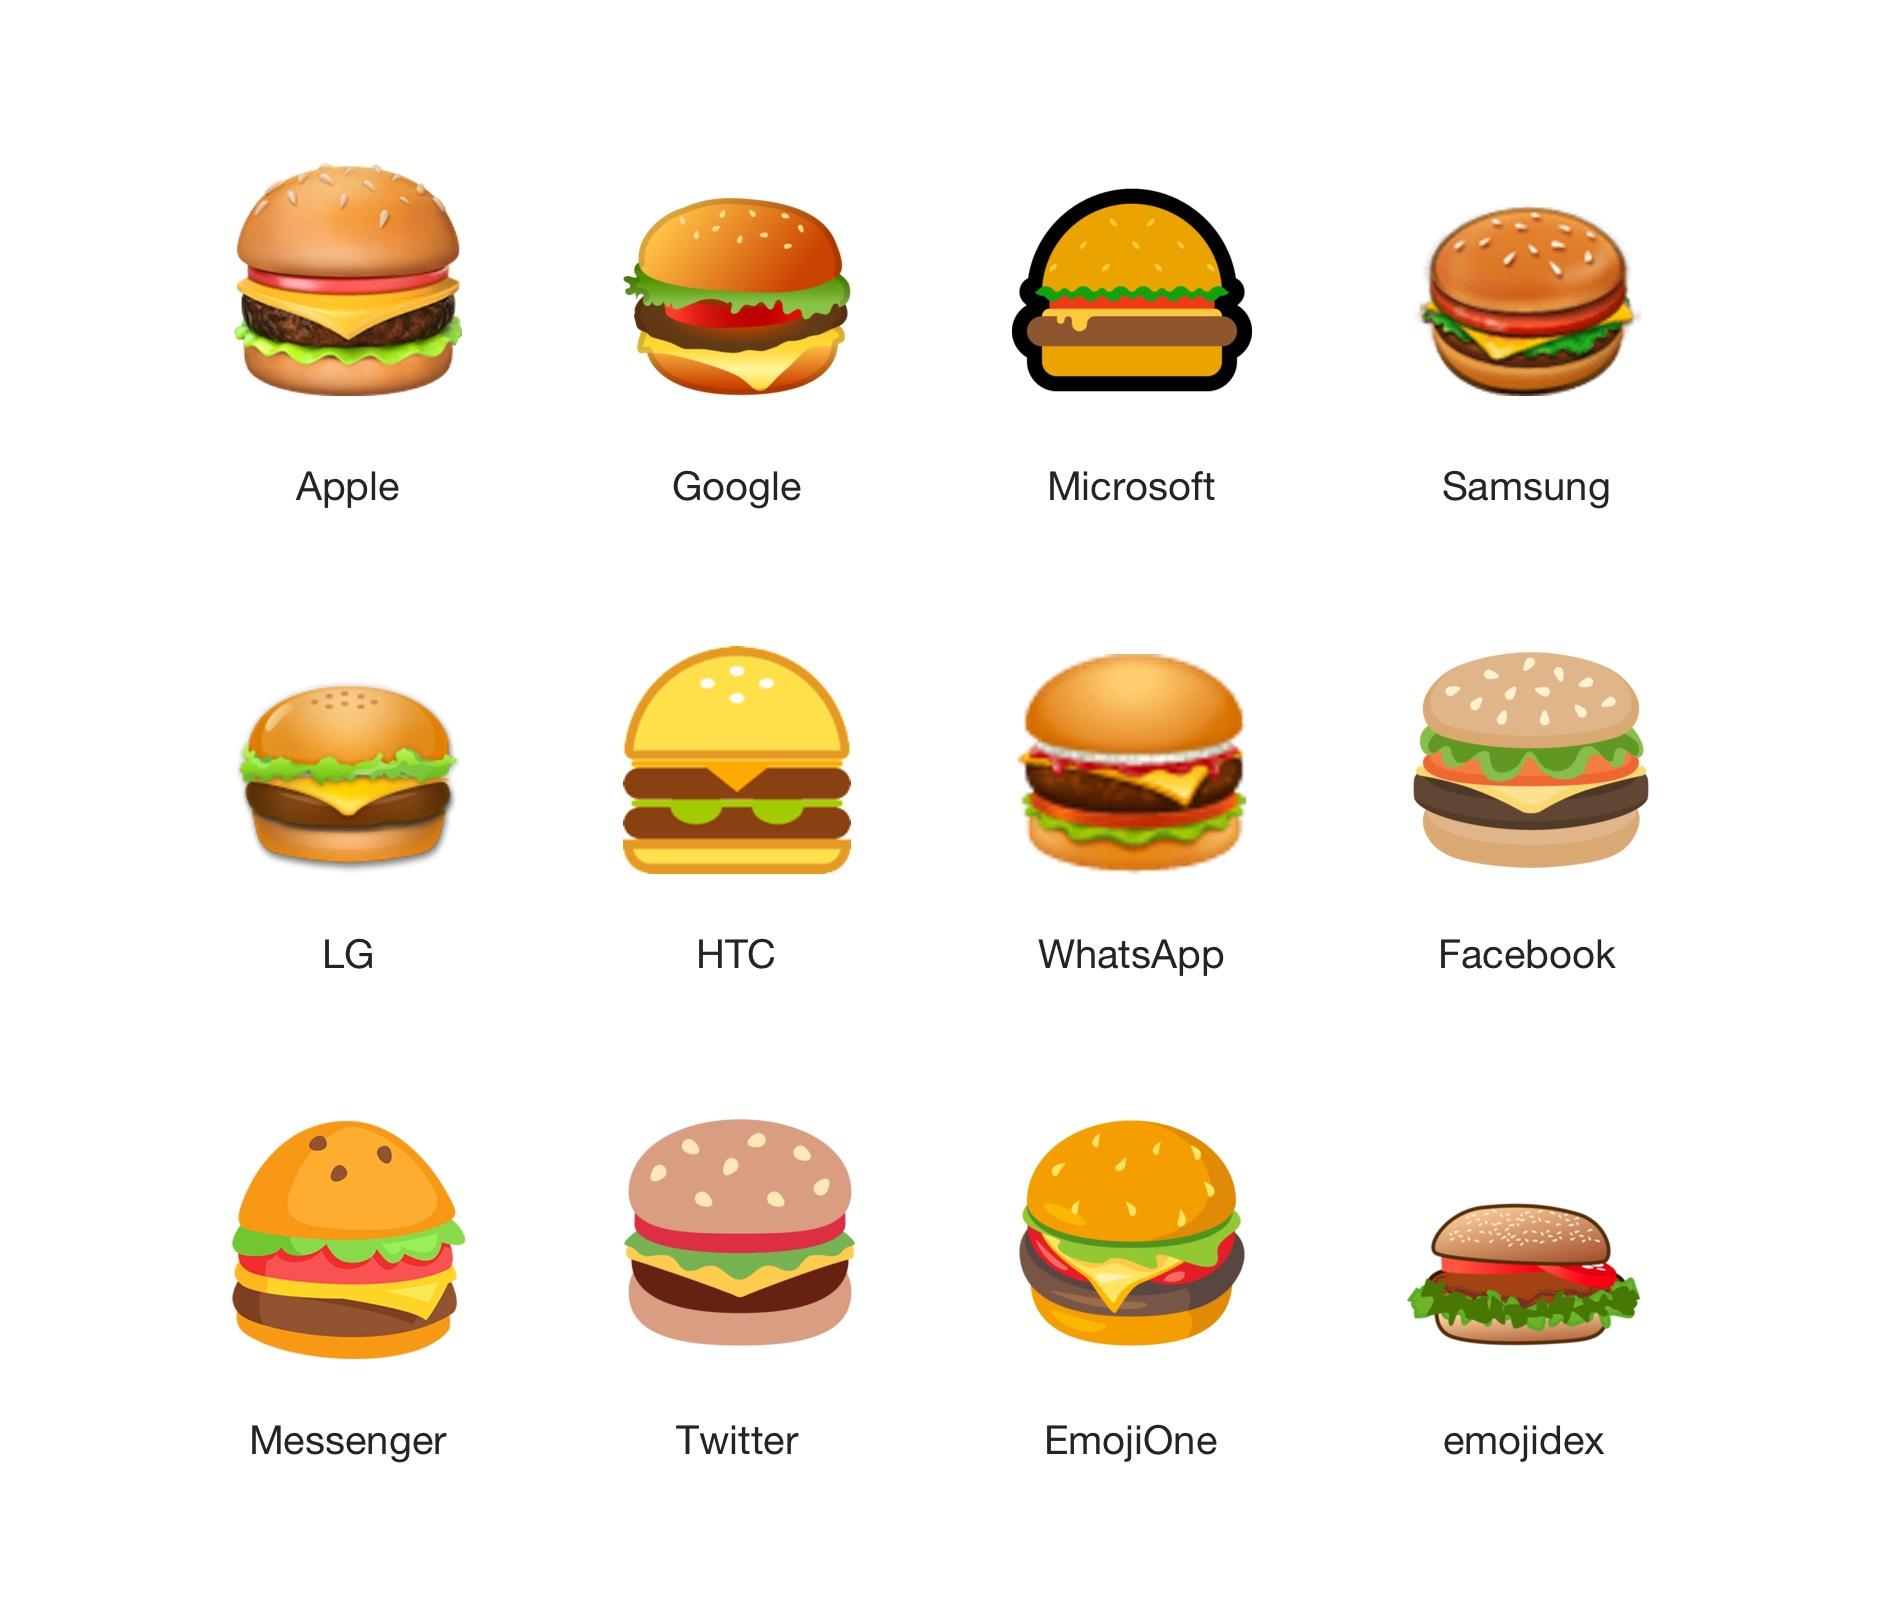 burger-emoji-platform-comparison-emojipedia